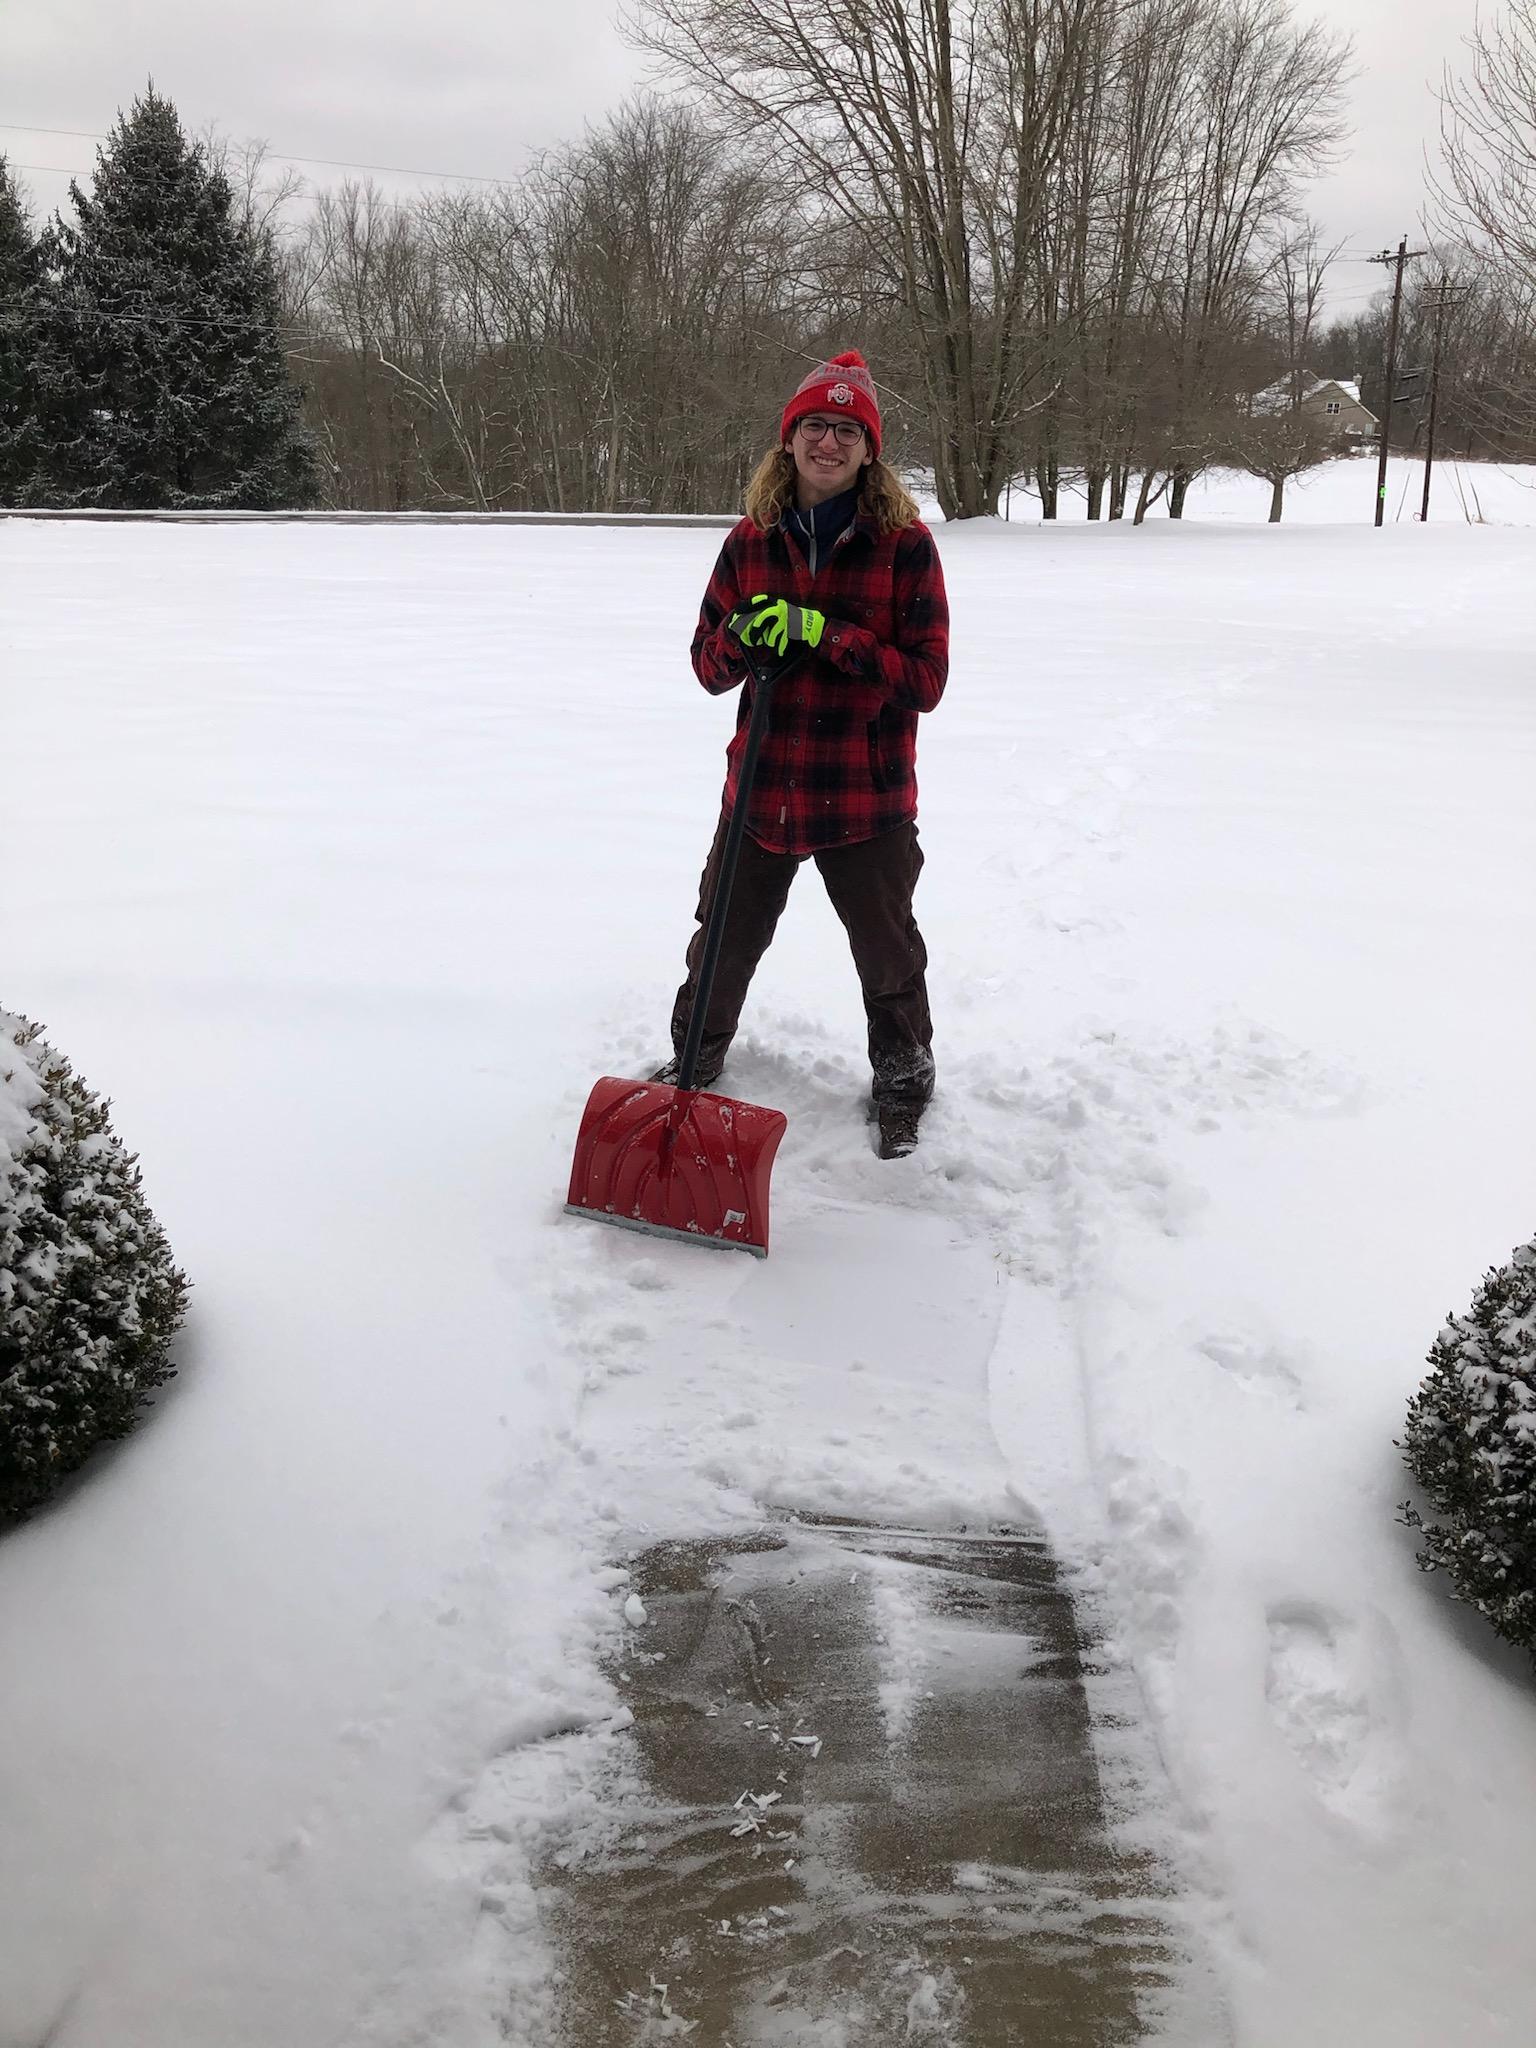 Student shovels snow from sidewalk